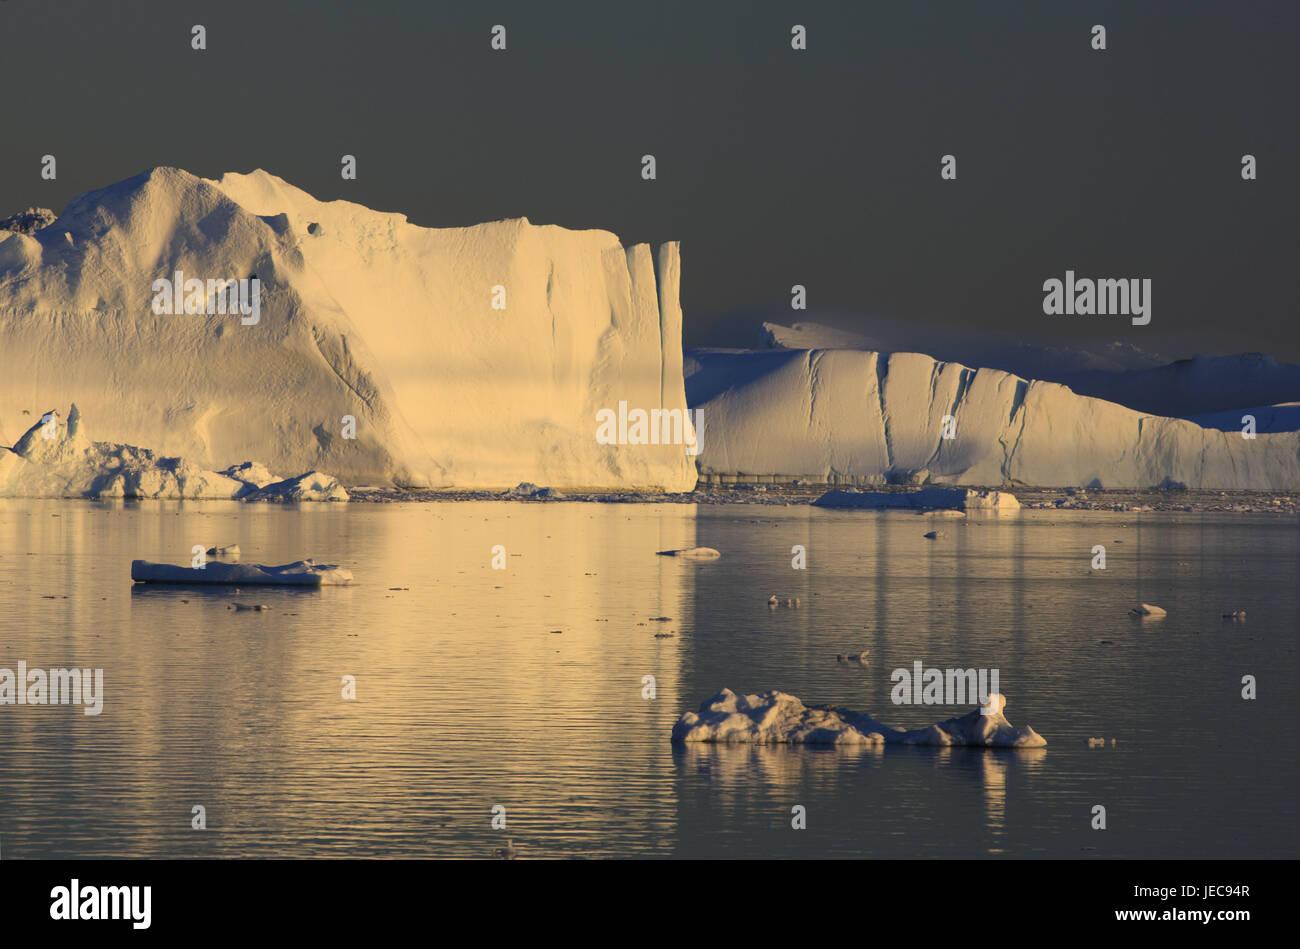 Greenland, Disco Bay, Ilulissat, fjord, icebergs, evening light, Western Greenland, ice, glacier, the Arctic, summer, - Stock Image